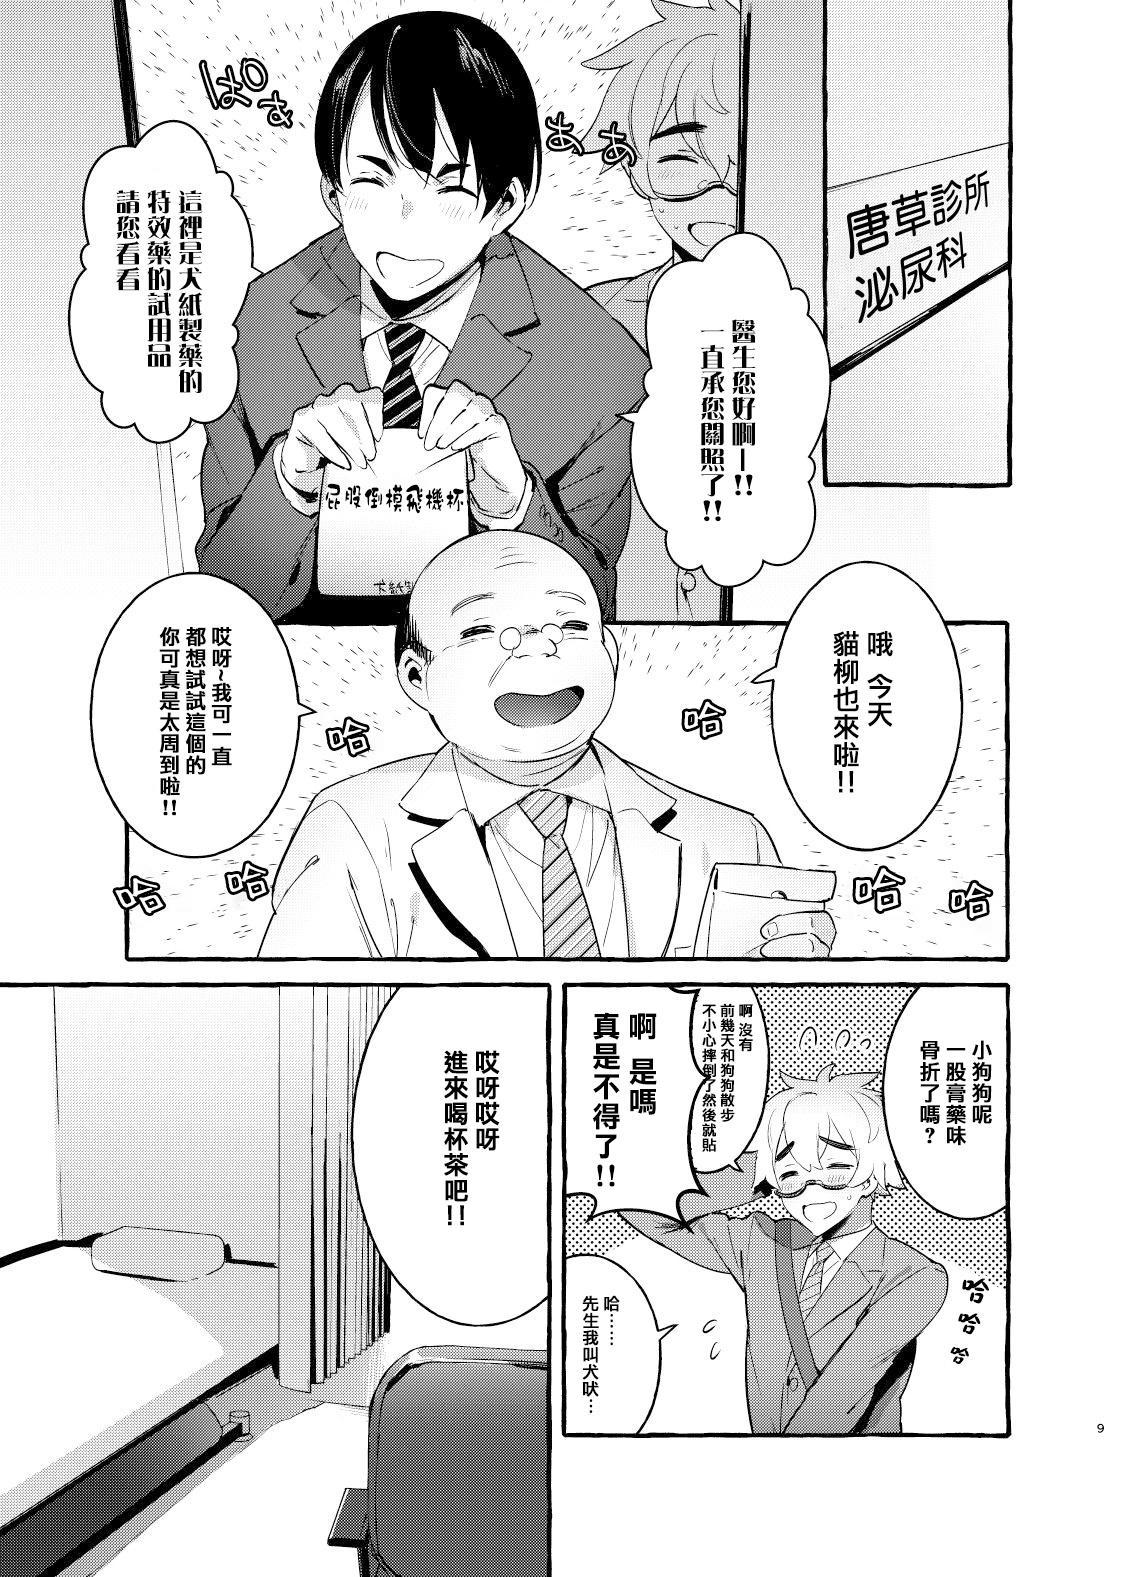 [Otosan no Kurorekishi (Maemukina Do M)]  Wanwan Otou-san   犬系爸爸 01-02 [Chinese] [拾荒者汉化组] [Digital] 9